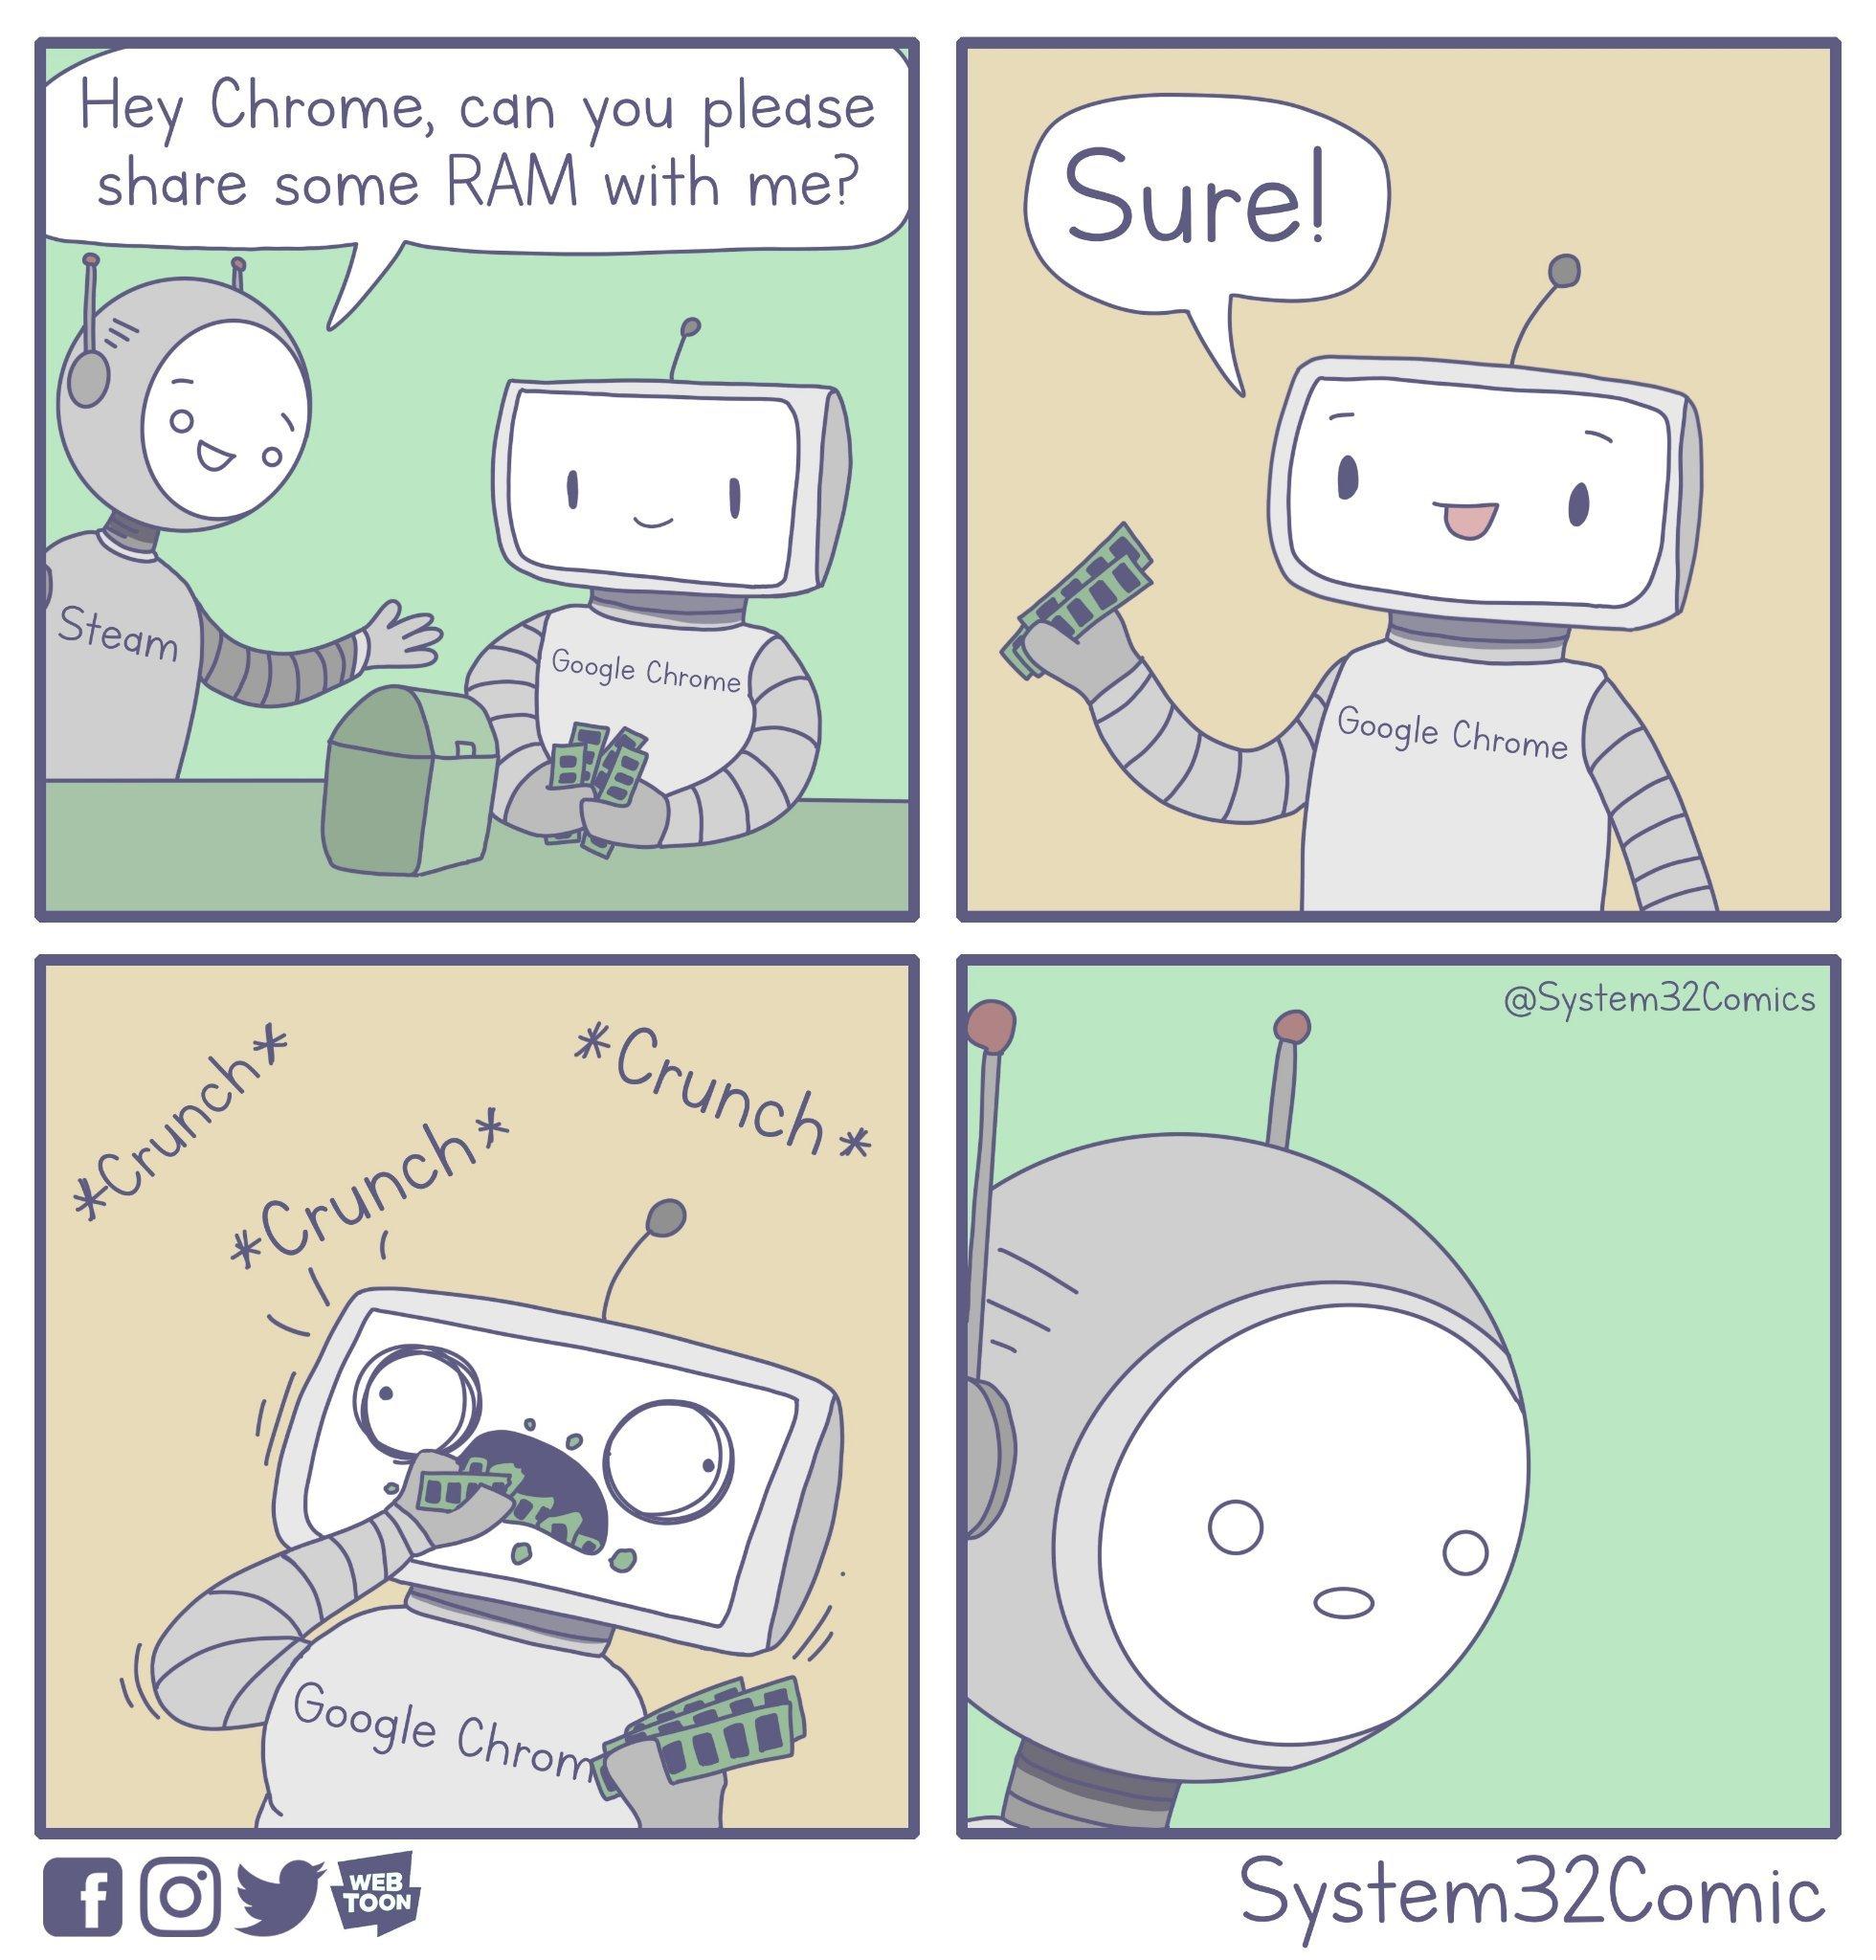 Sharing RAM [OC] - meme